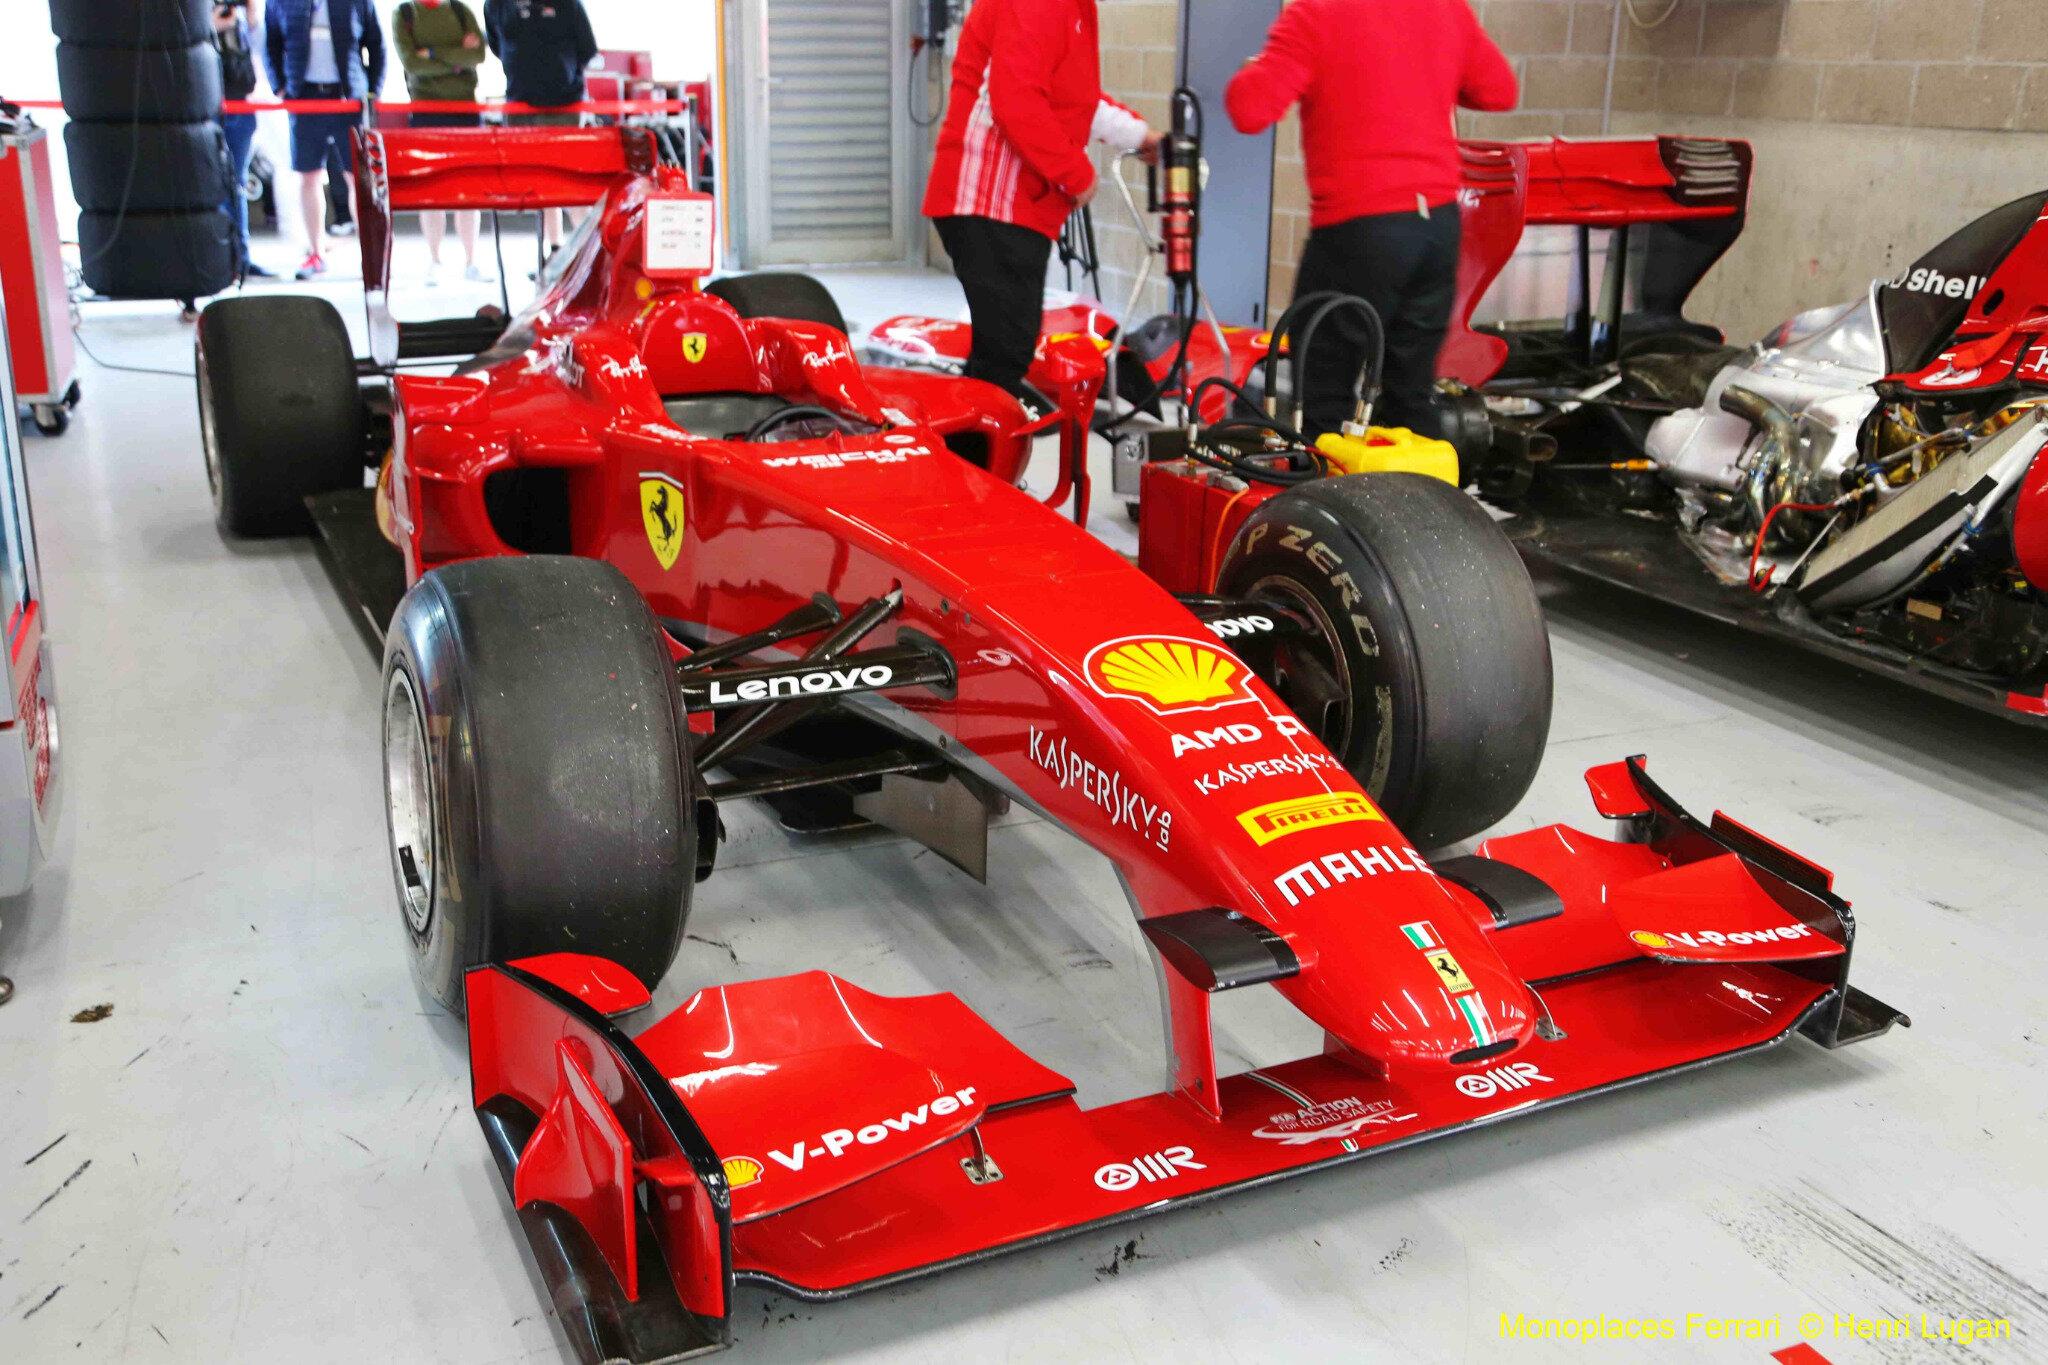 2009 - Ferrari F60 F1 #276_09 [I] HL_GF